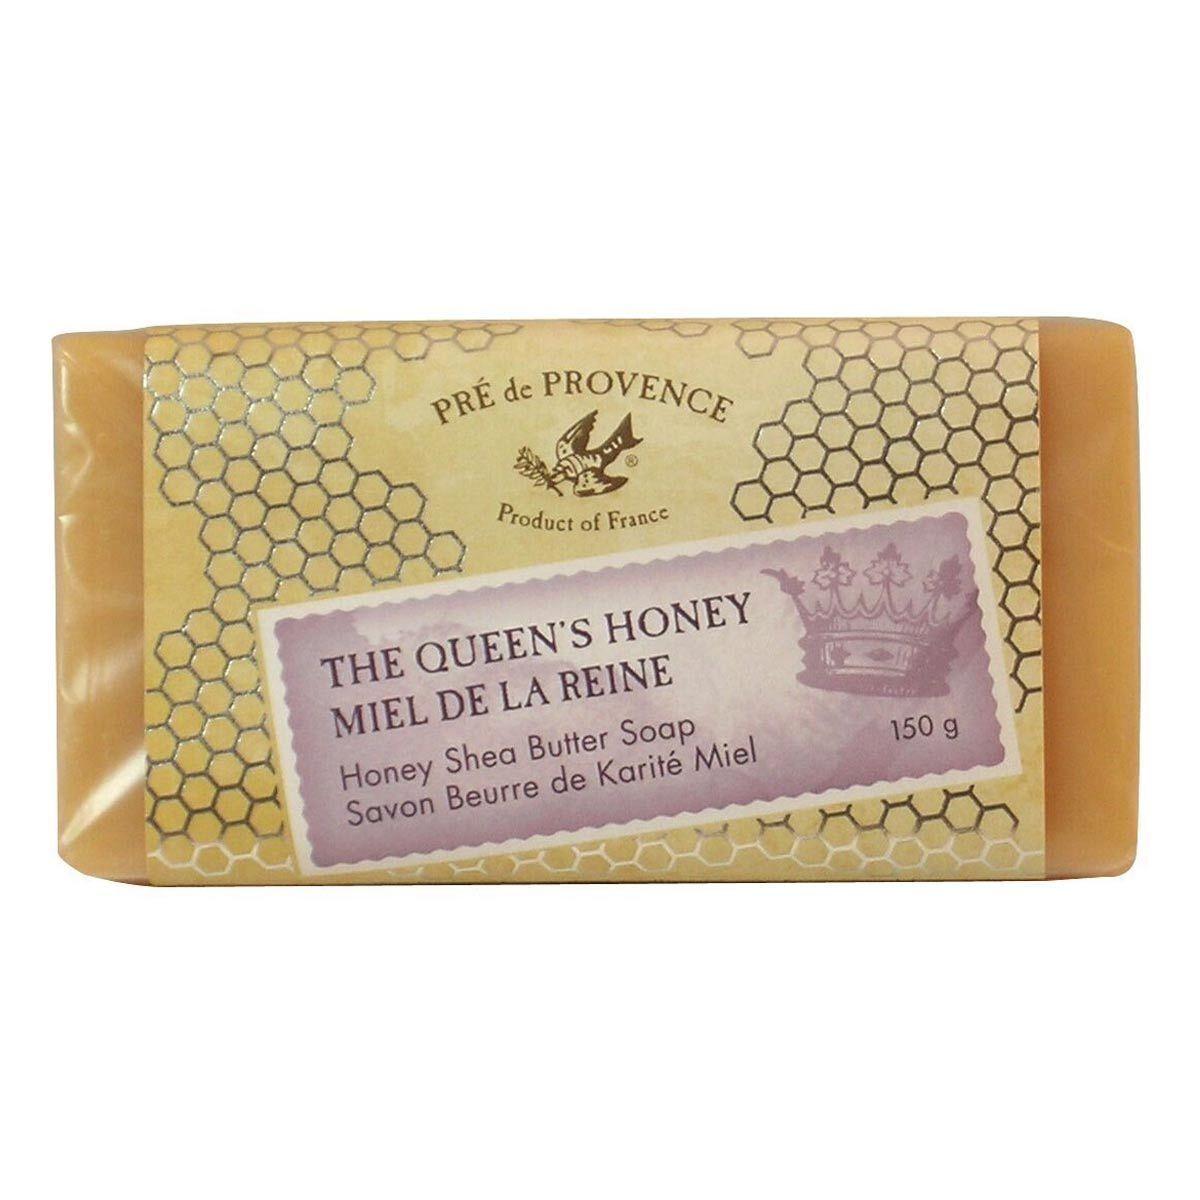 Pre de Provence - Queen#39;s Honey Soap